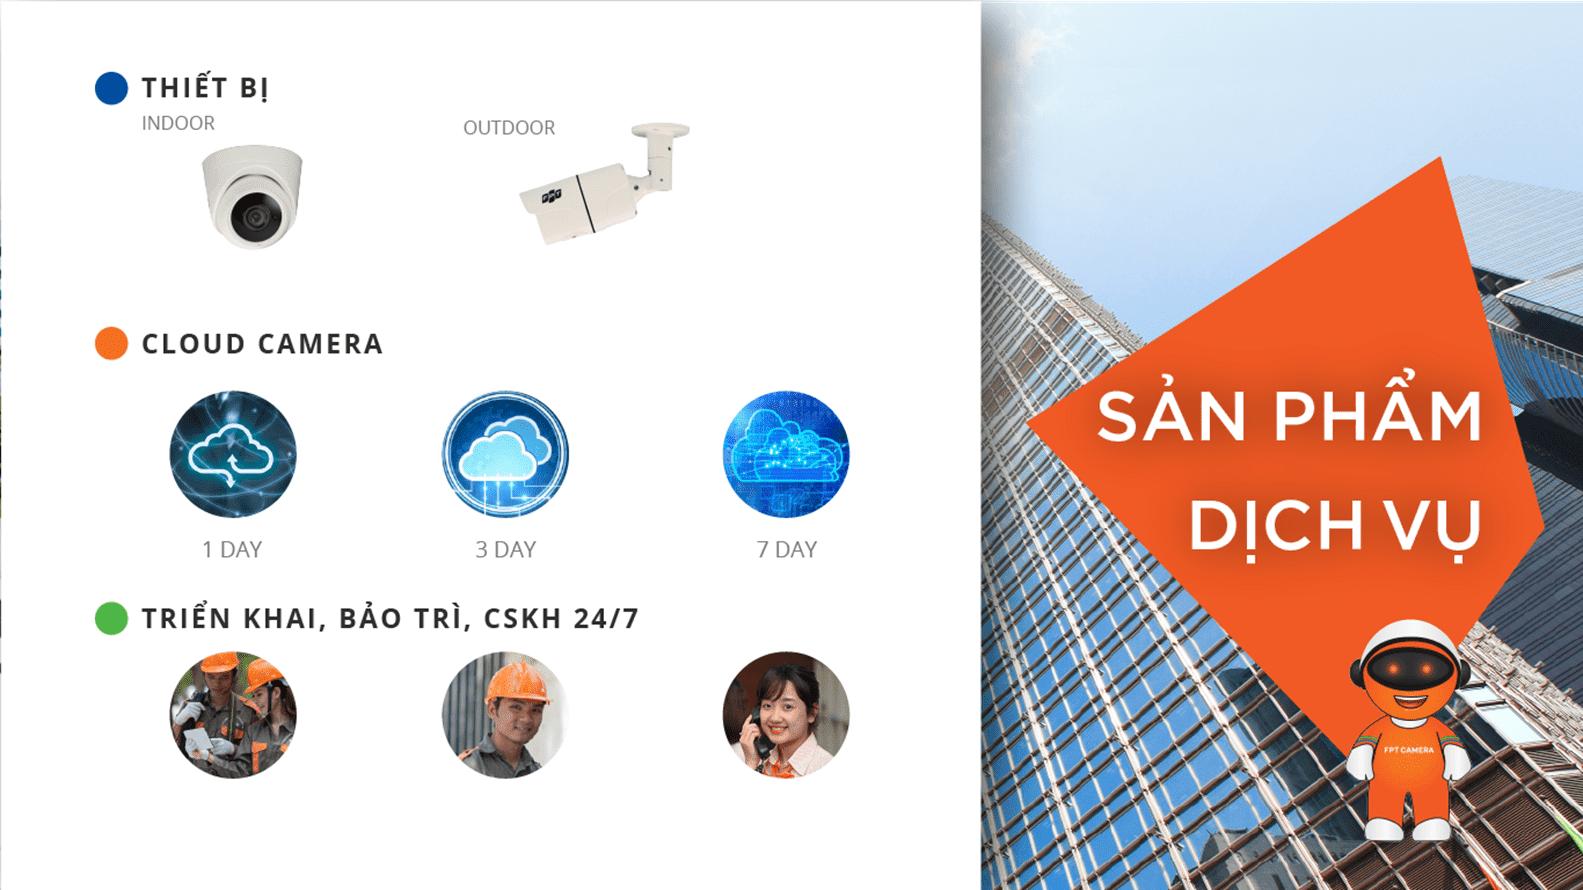 Review Camera FPT - Camera lưu trữ Cloud chính hãng FPT Telecom